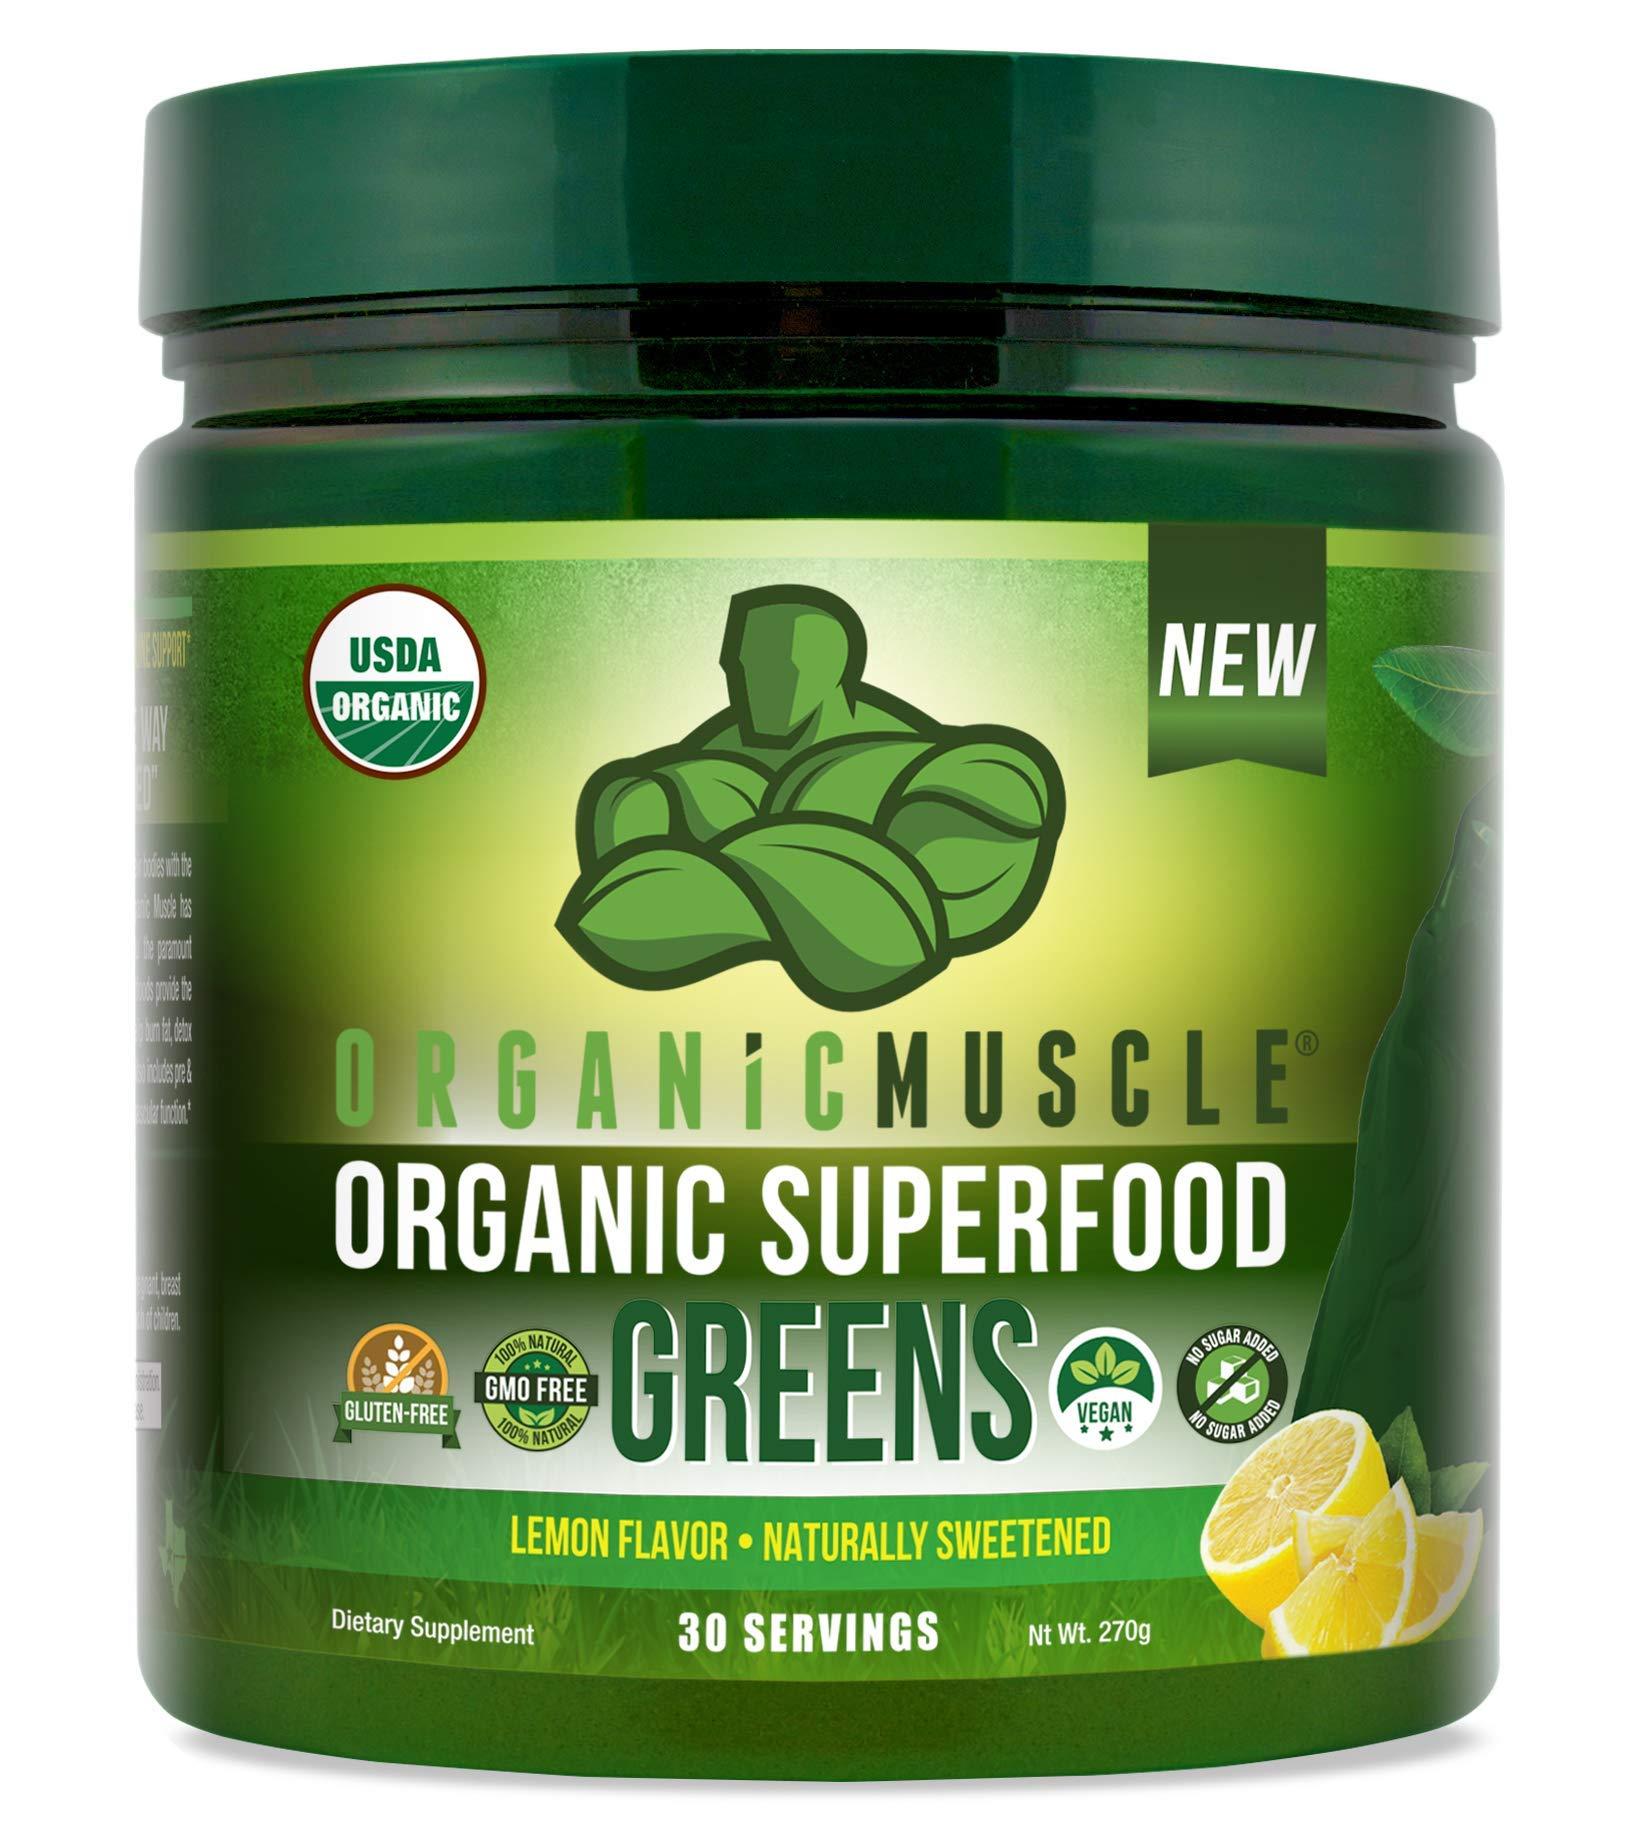 Certified Organic Superfood Greens Powder   Keto Green Juice Supplement for Energy, Detox, Immune & Gut Health w/Pre & Probiotic Blend   Vegan, Non-GMO, Lemon Flavor, 30 Serv  ★PRE-Order Rate★